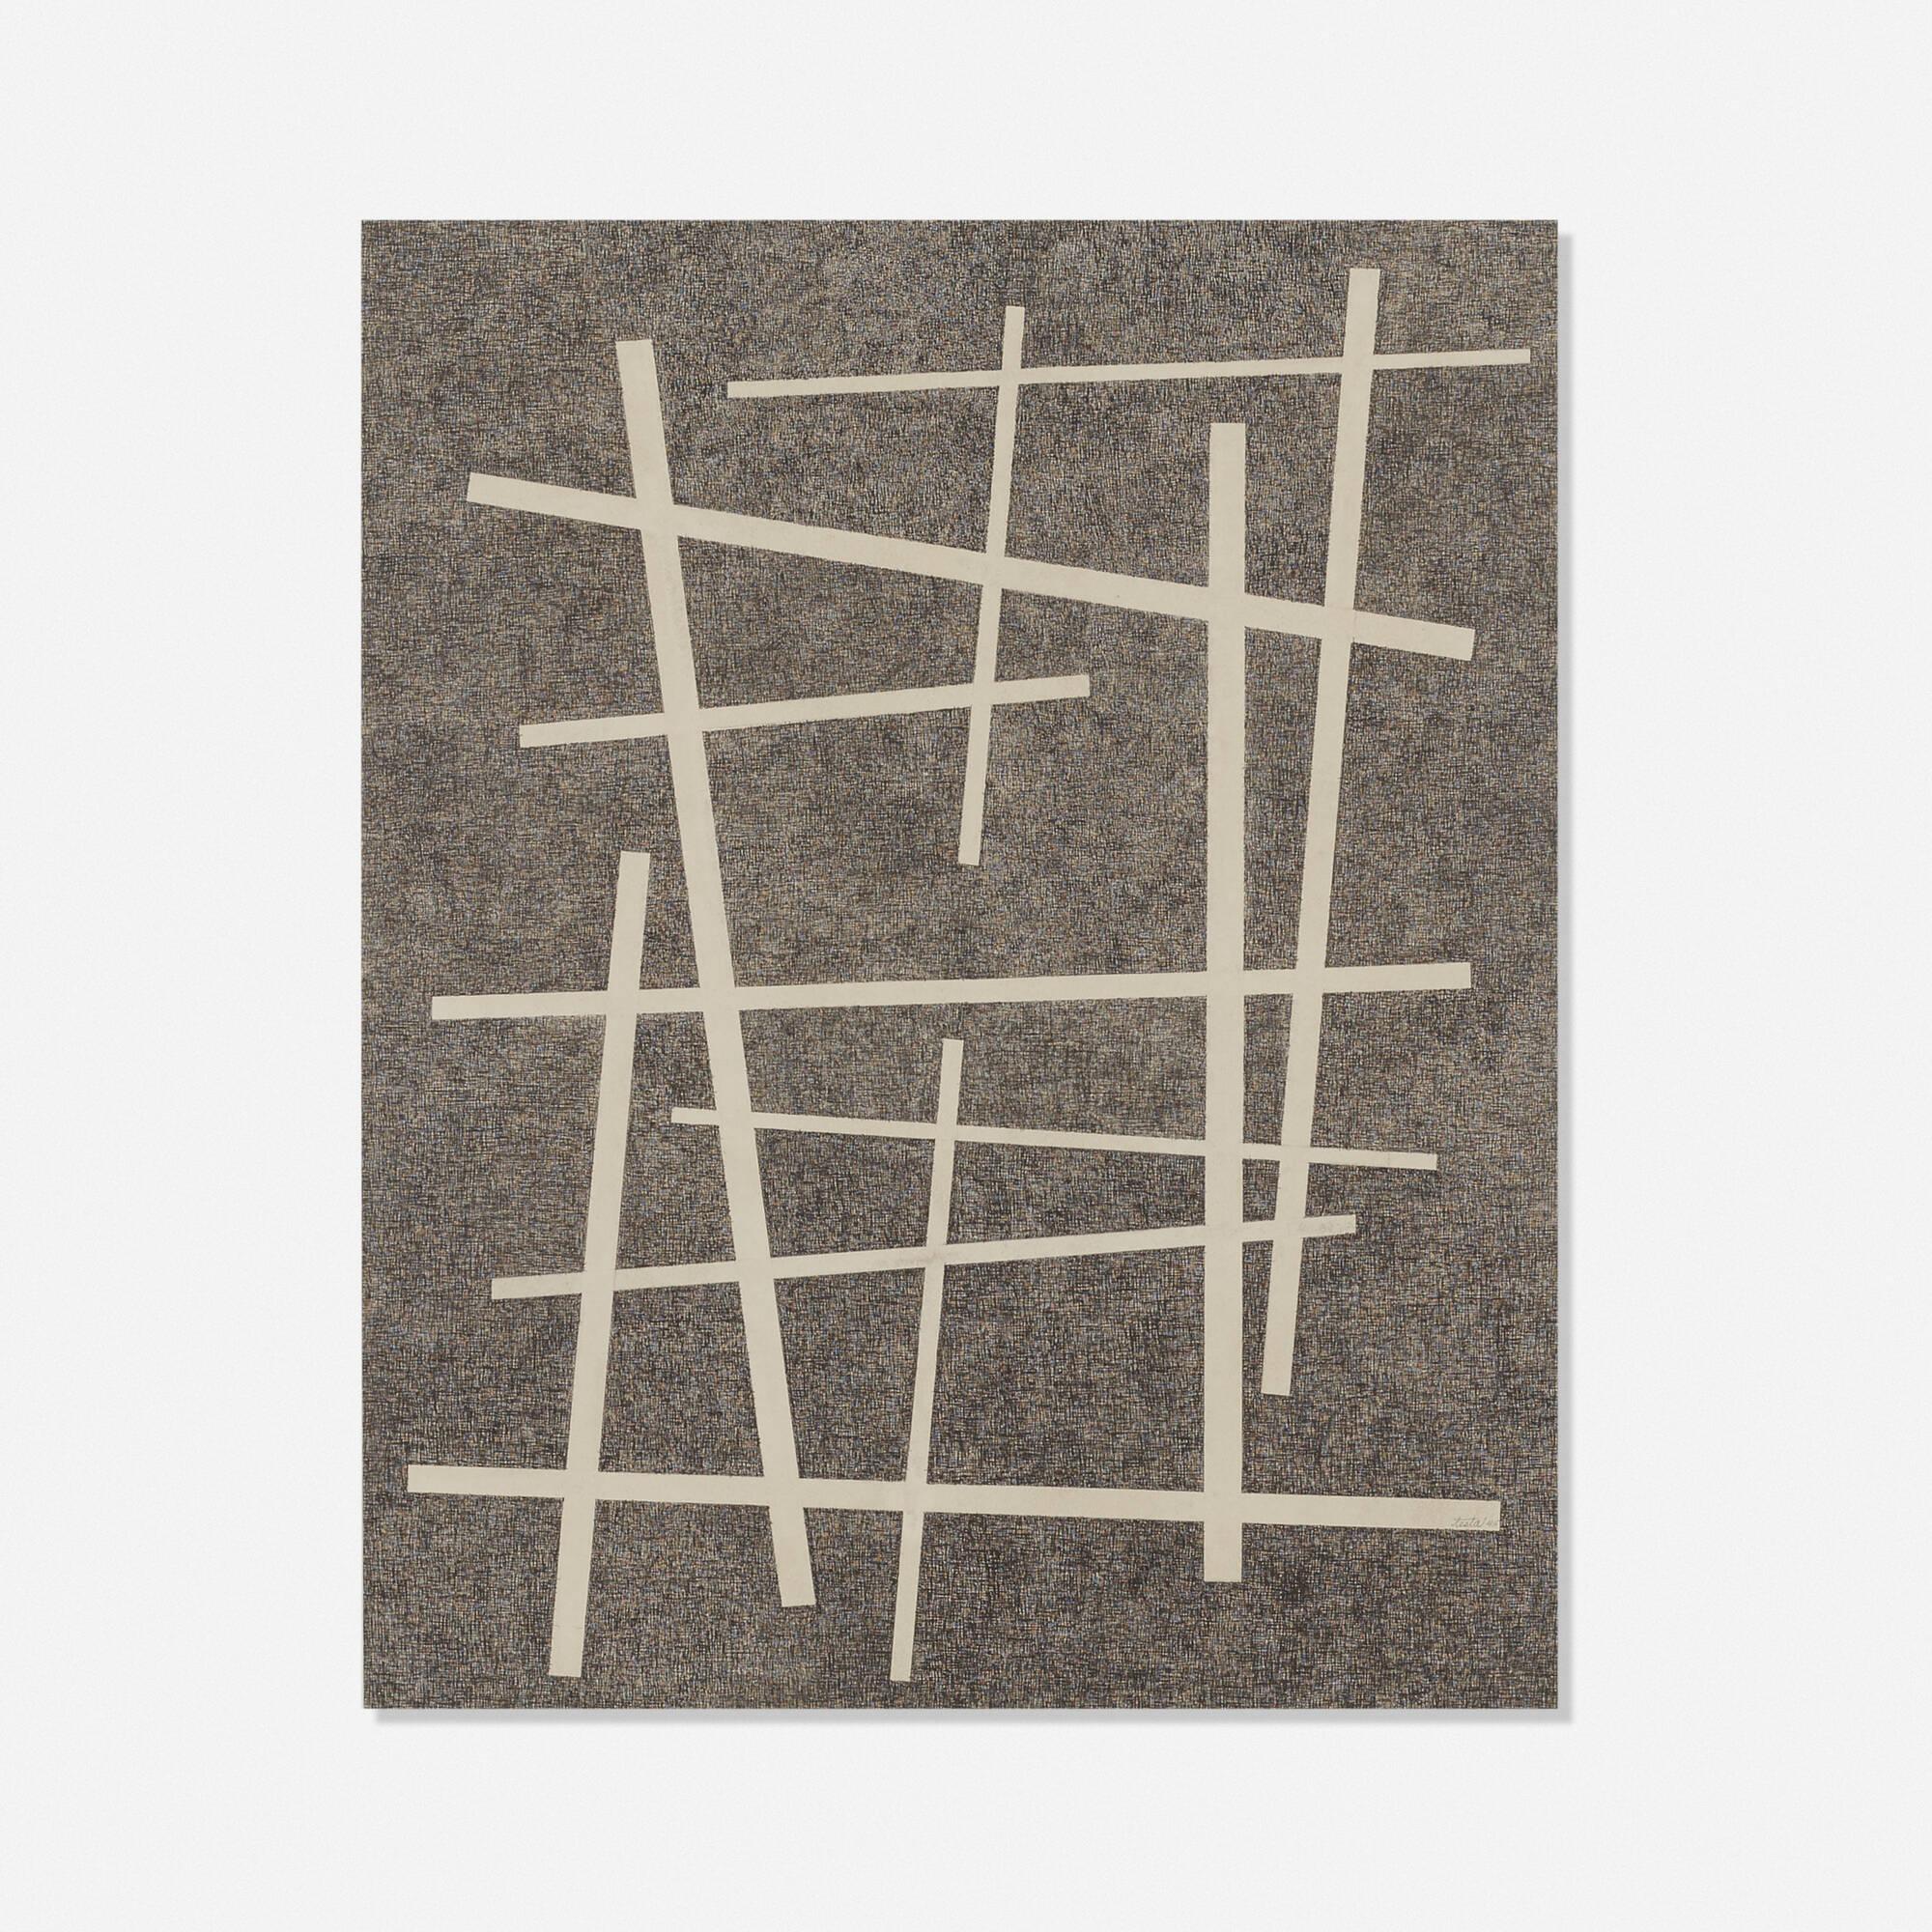 205: Angelo Testa / Untitled (1 of 1)